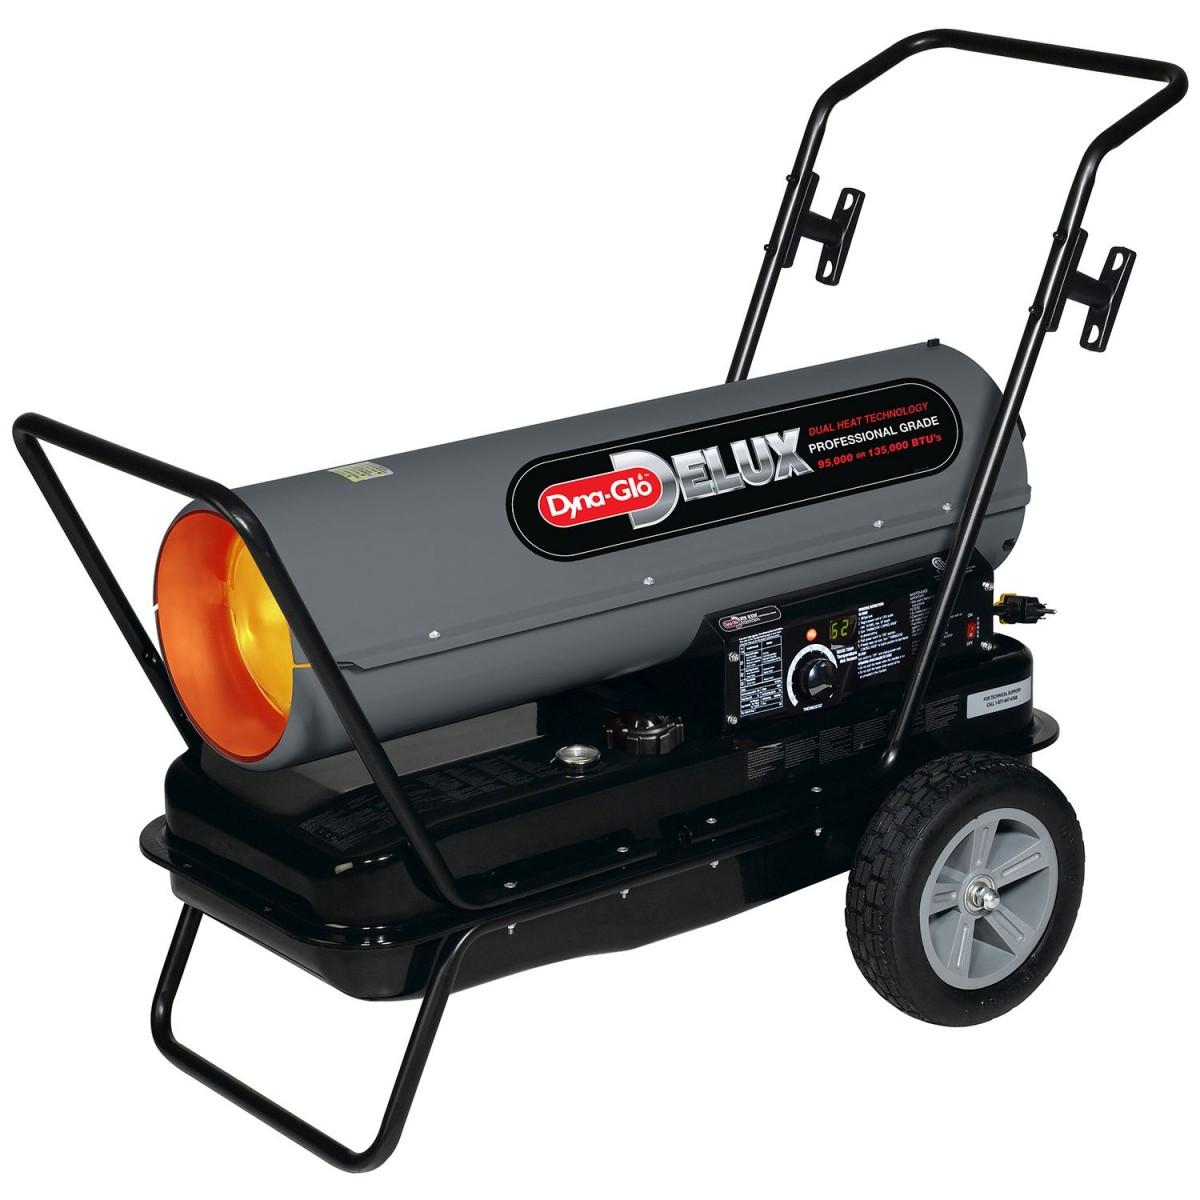 Dyna Glo Delux Portable Heater Kfa135dgd